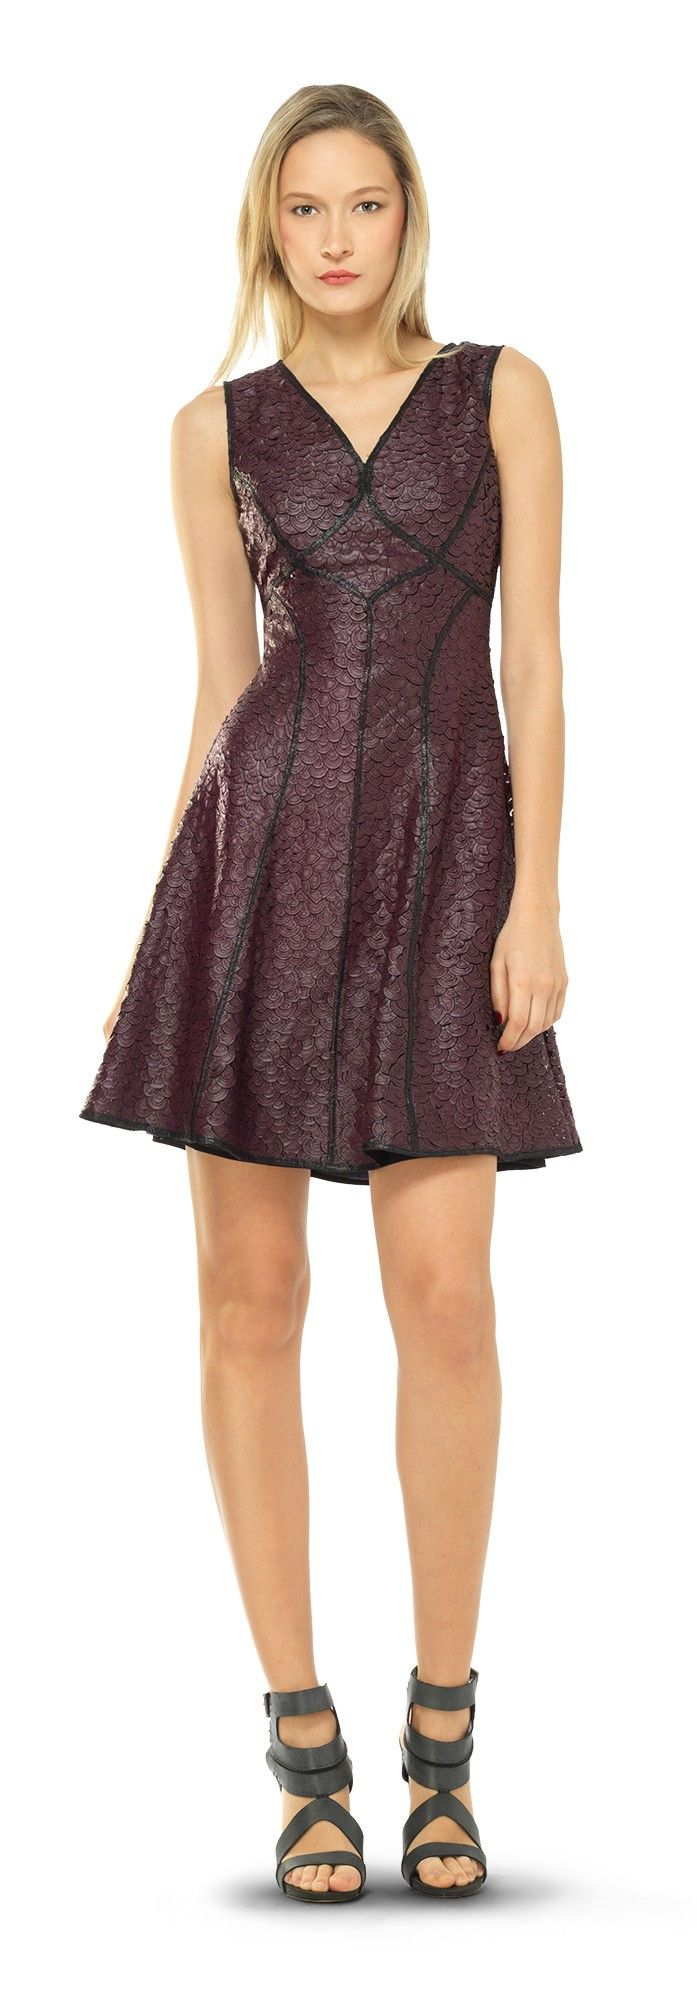 Fit And Flare Coated Applique Dress   Max Studio Official by Leon Max   MaxStudio.com